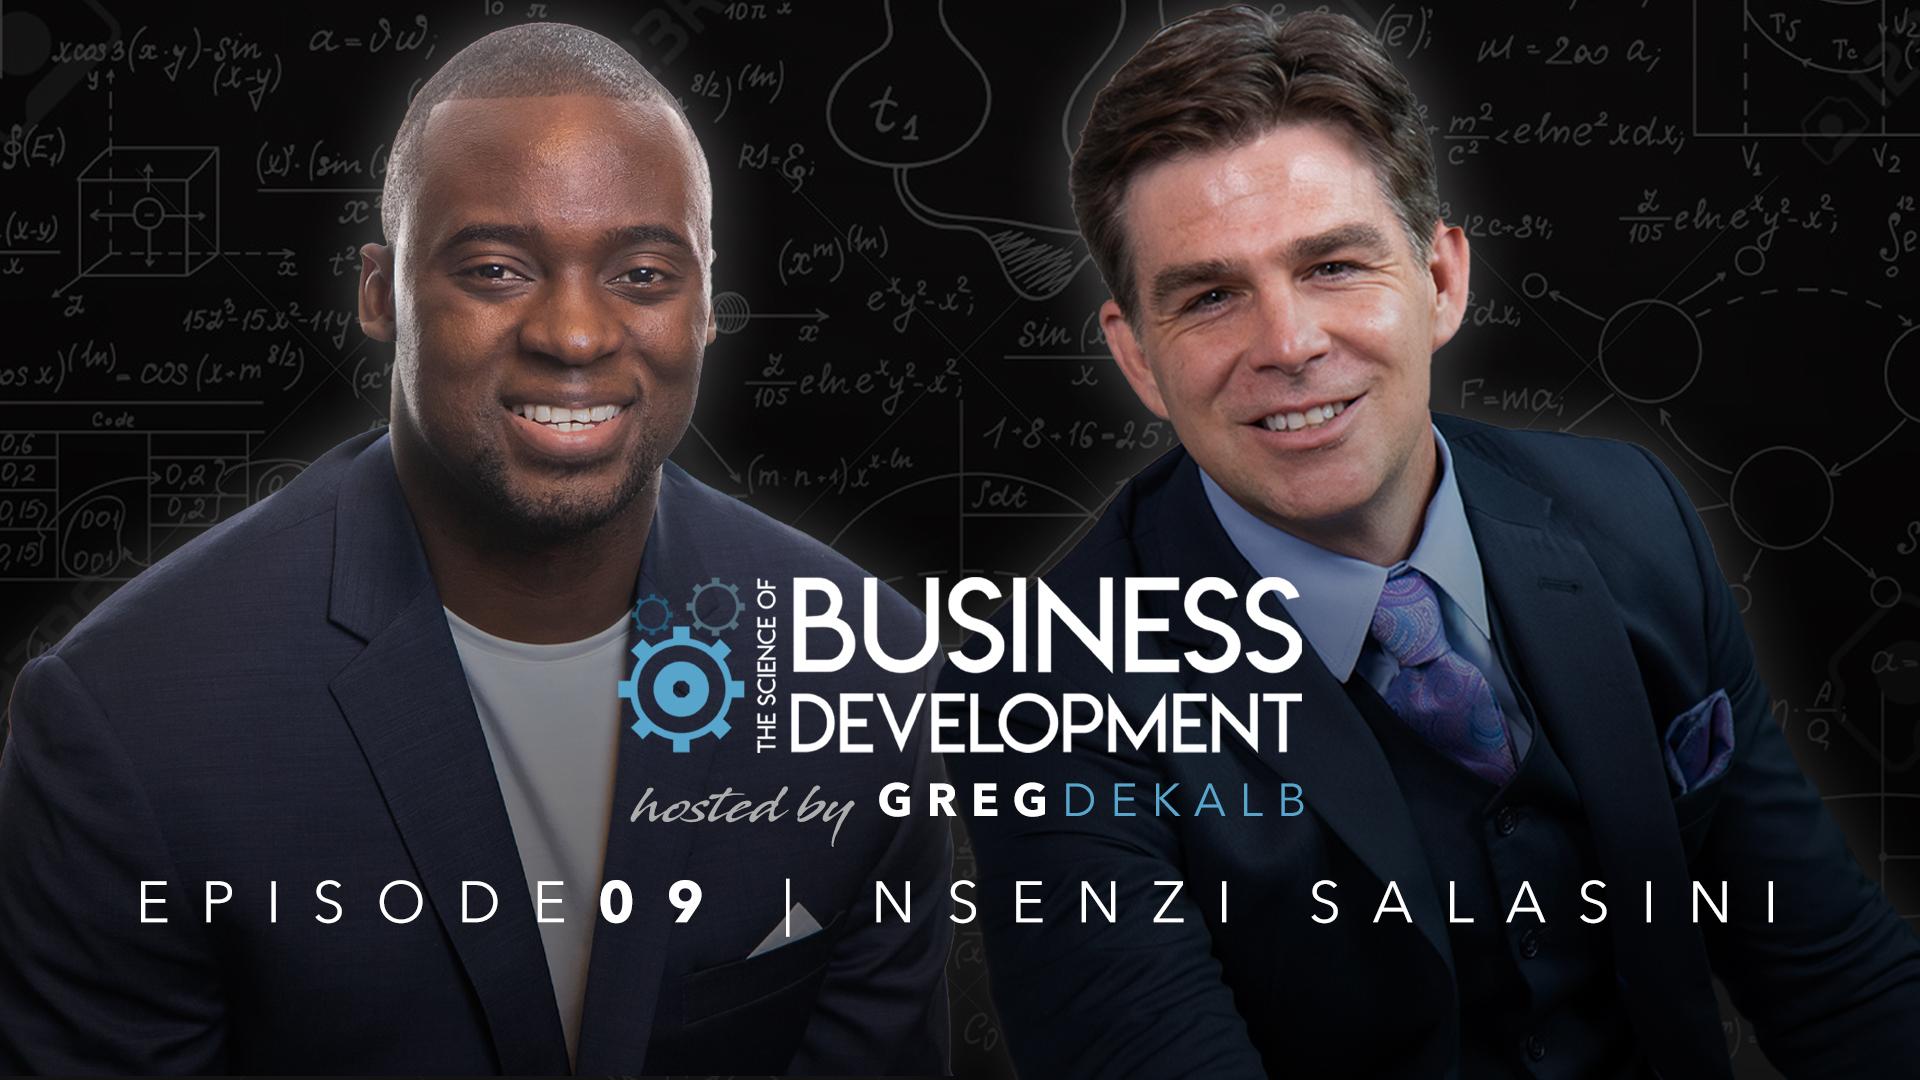 TSOBD Greg DeKalb with Nsenzi Salasini